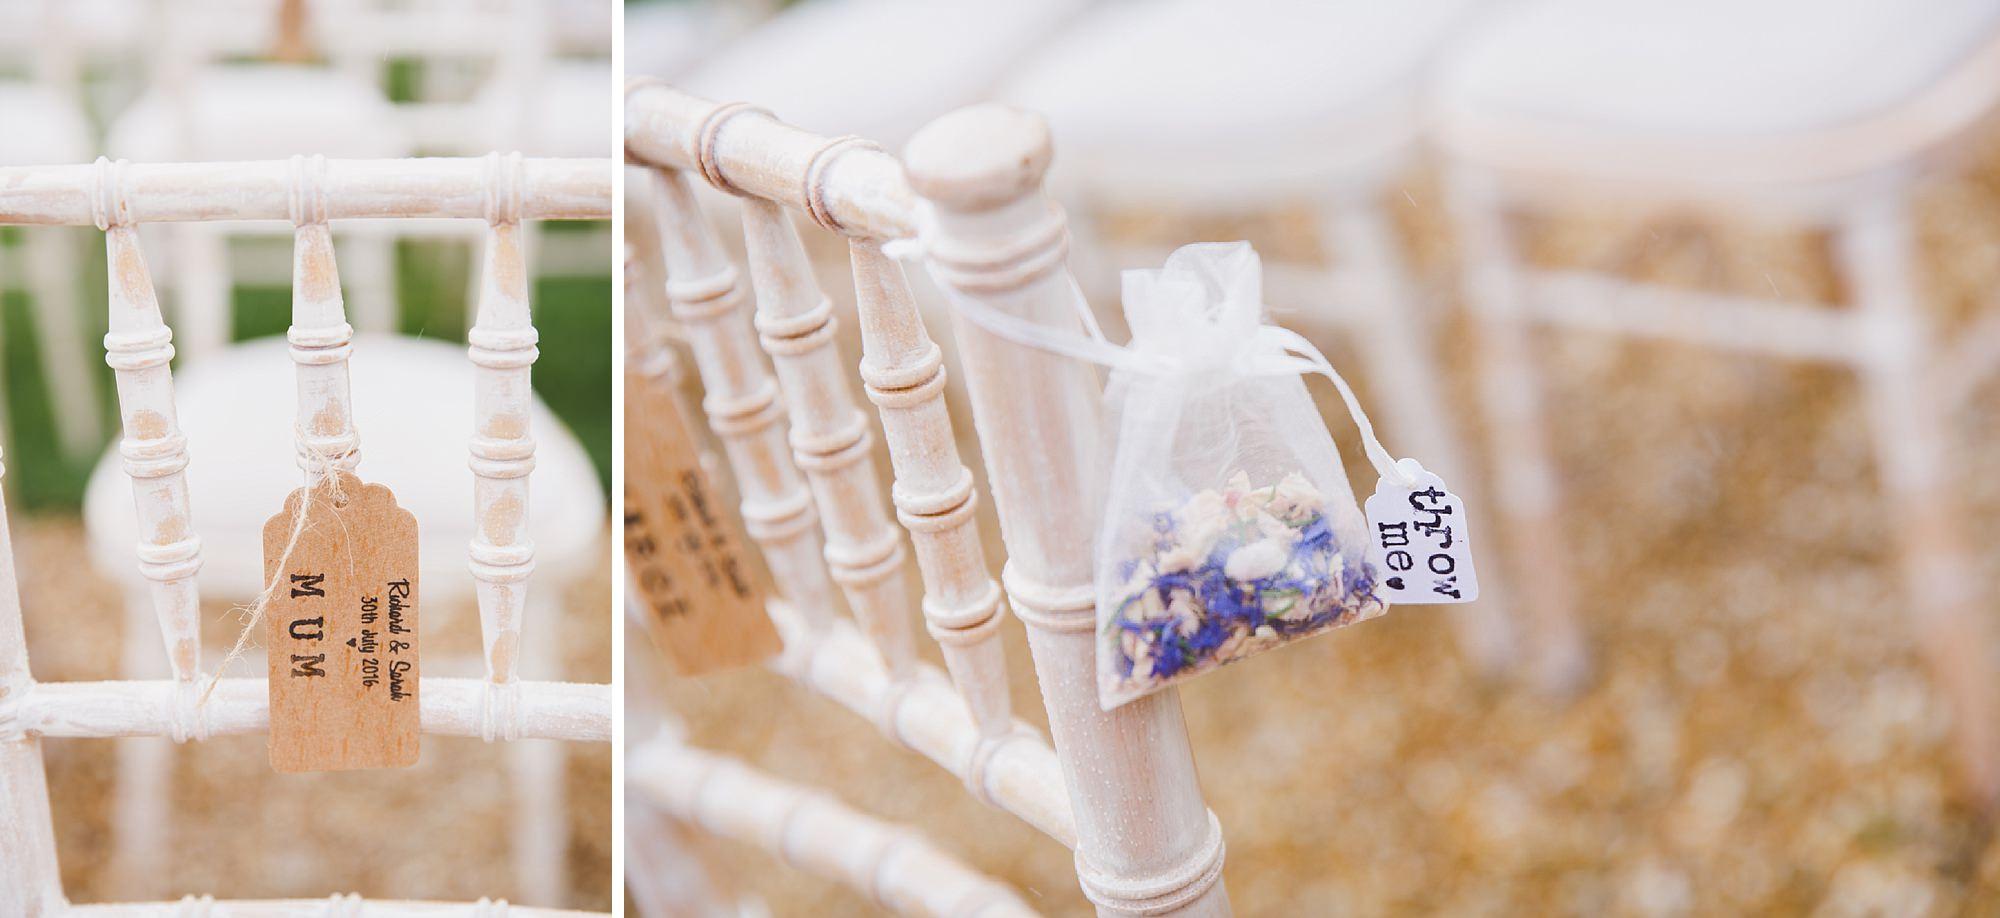 Bignor Park wedding photography chair labels